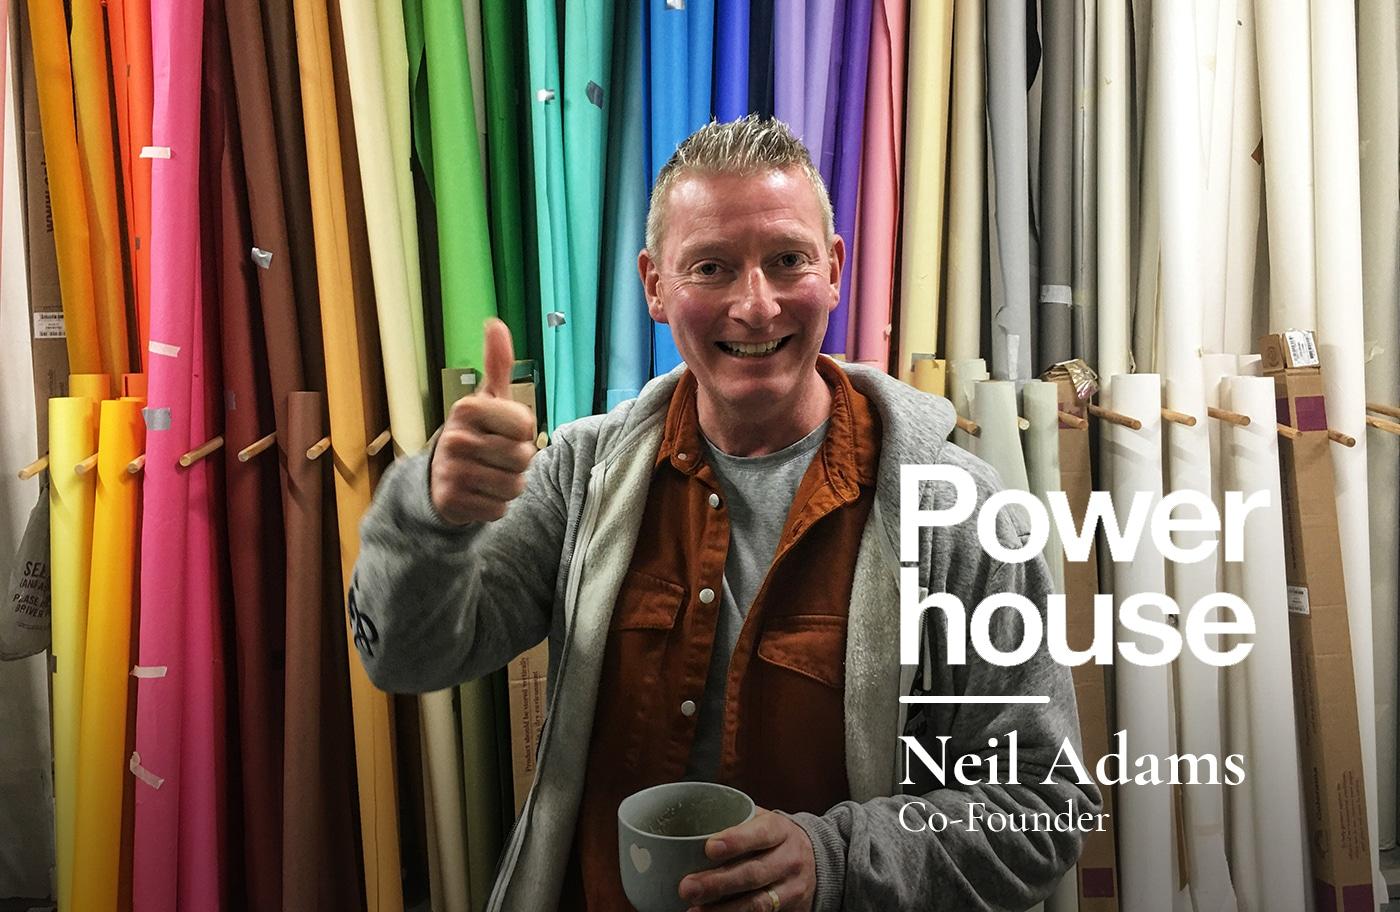 Neil Adams founder of Powerhouse Photo in Leeds